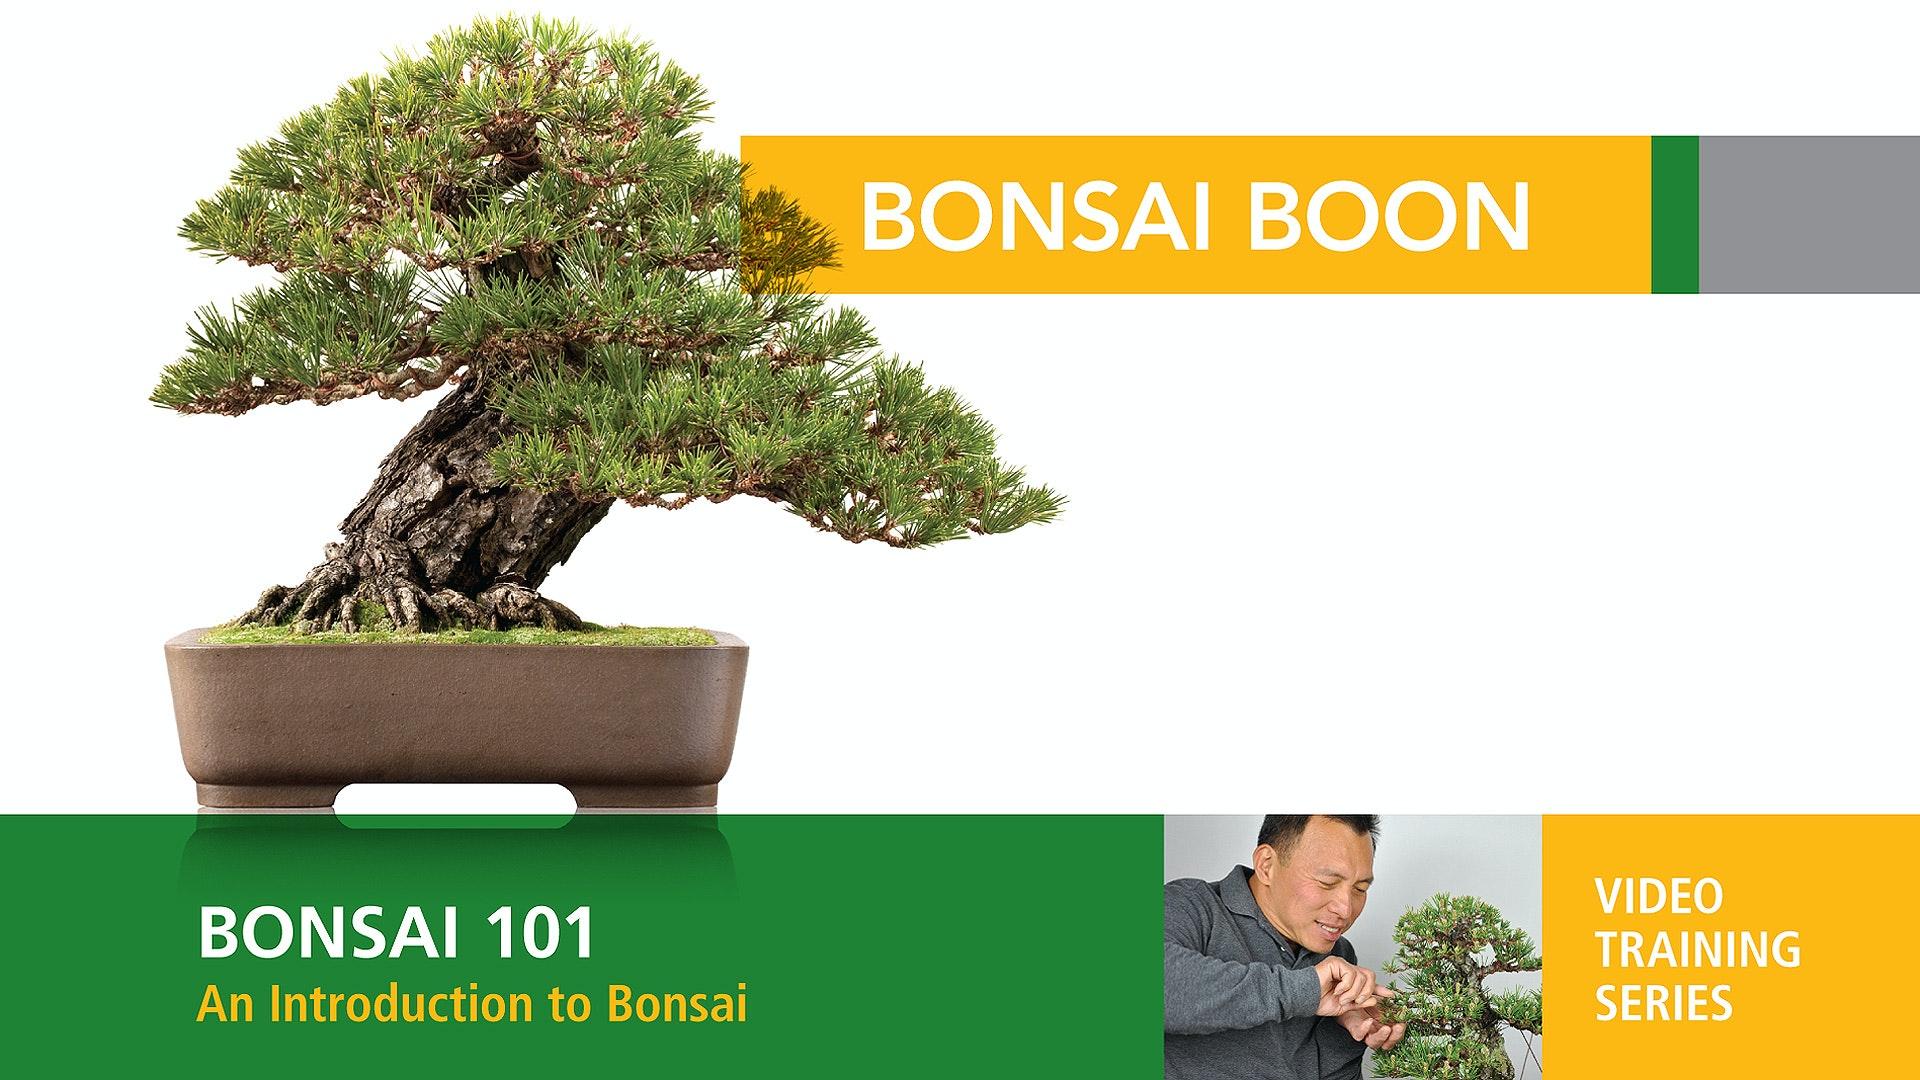 Bonsai 101: An Introduction to Bonsai